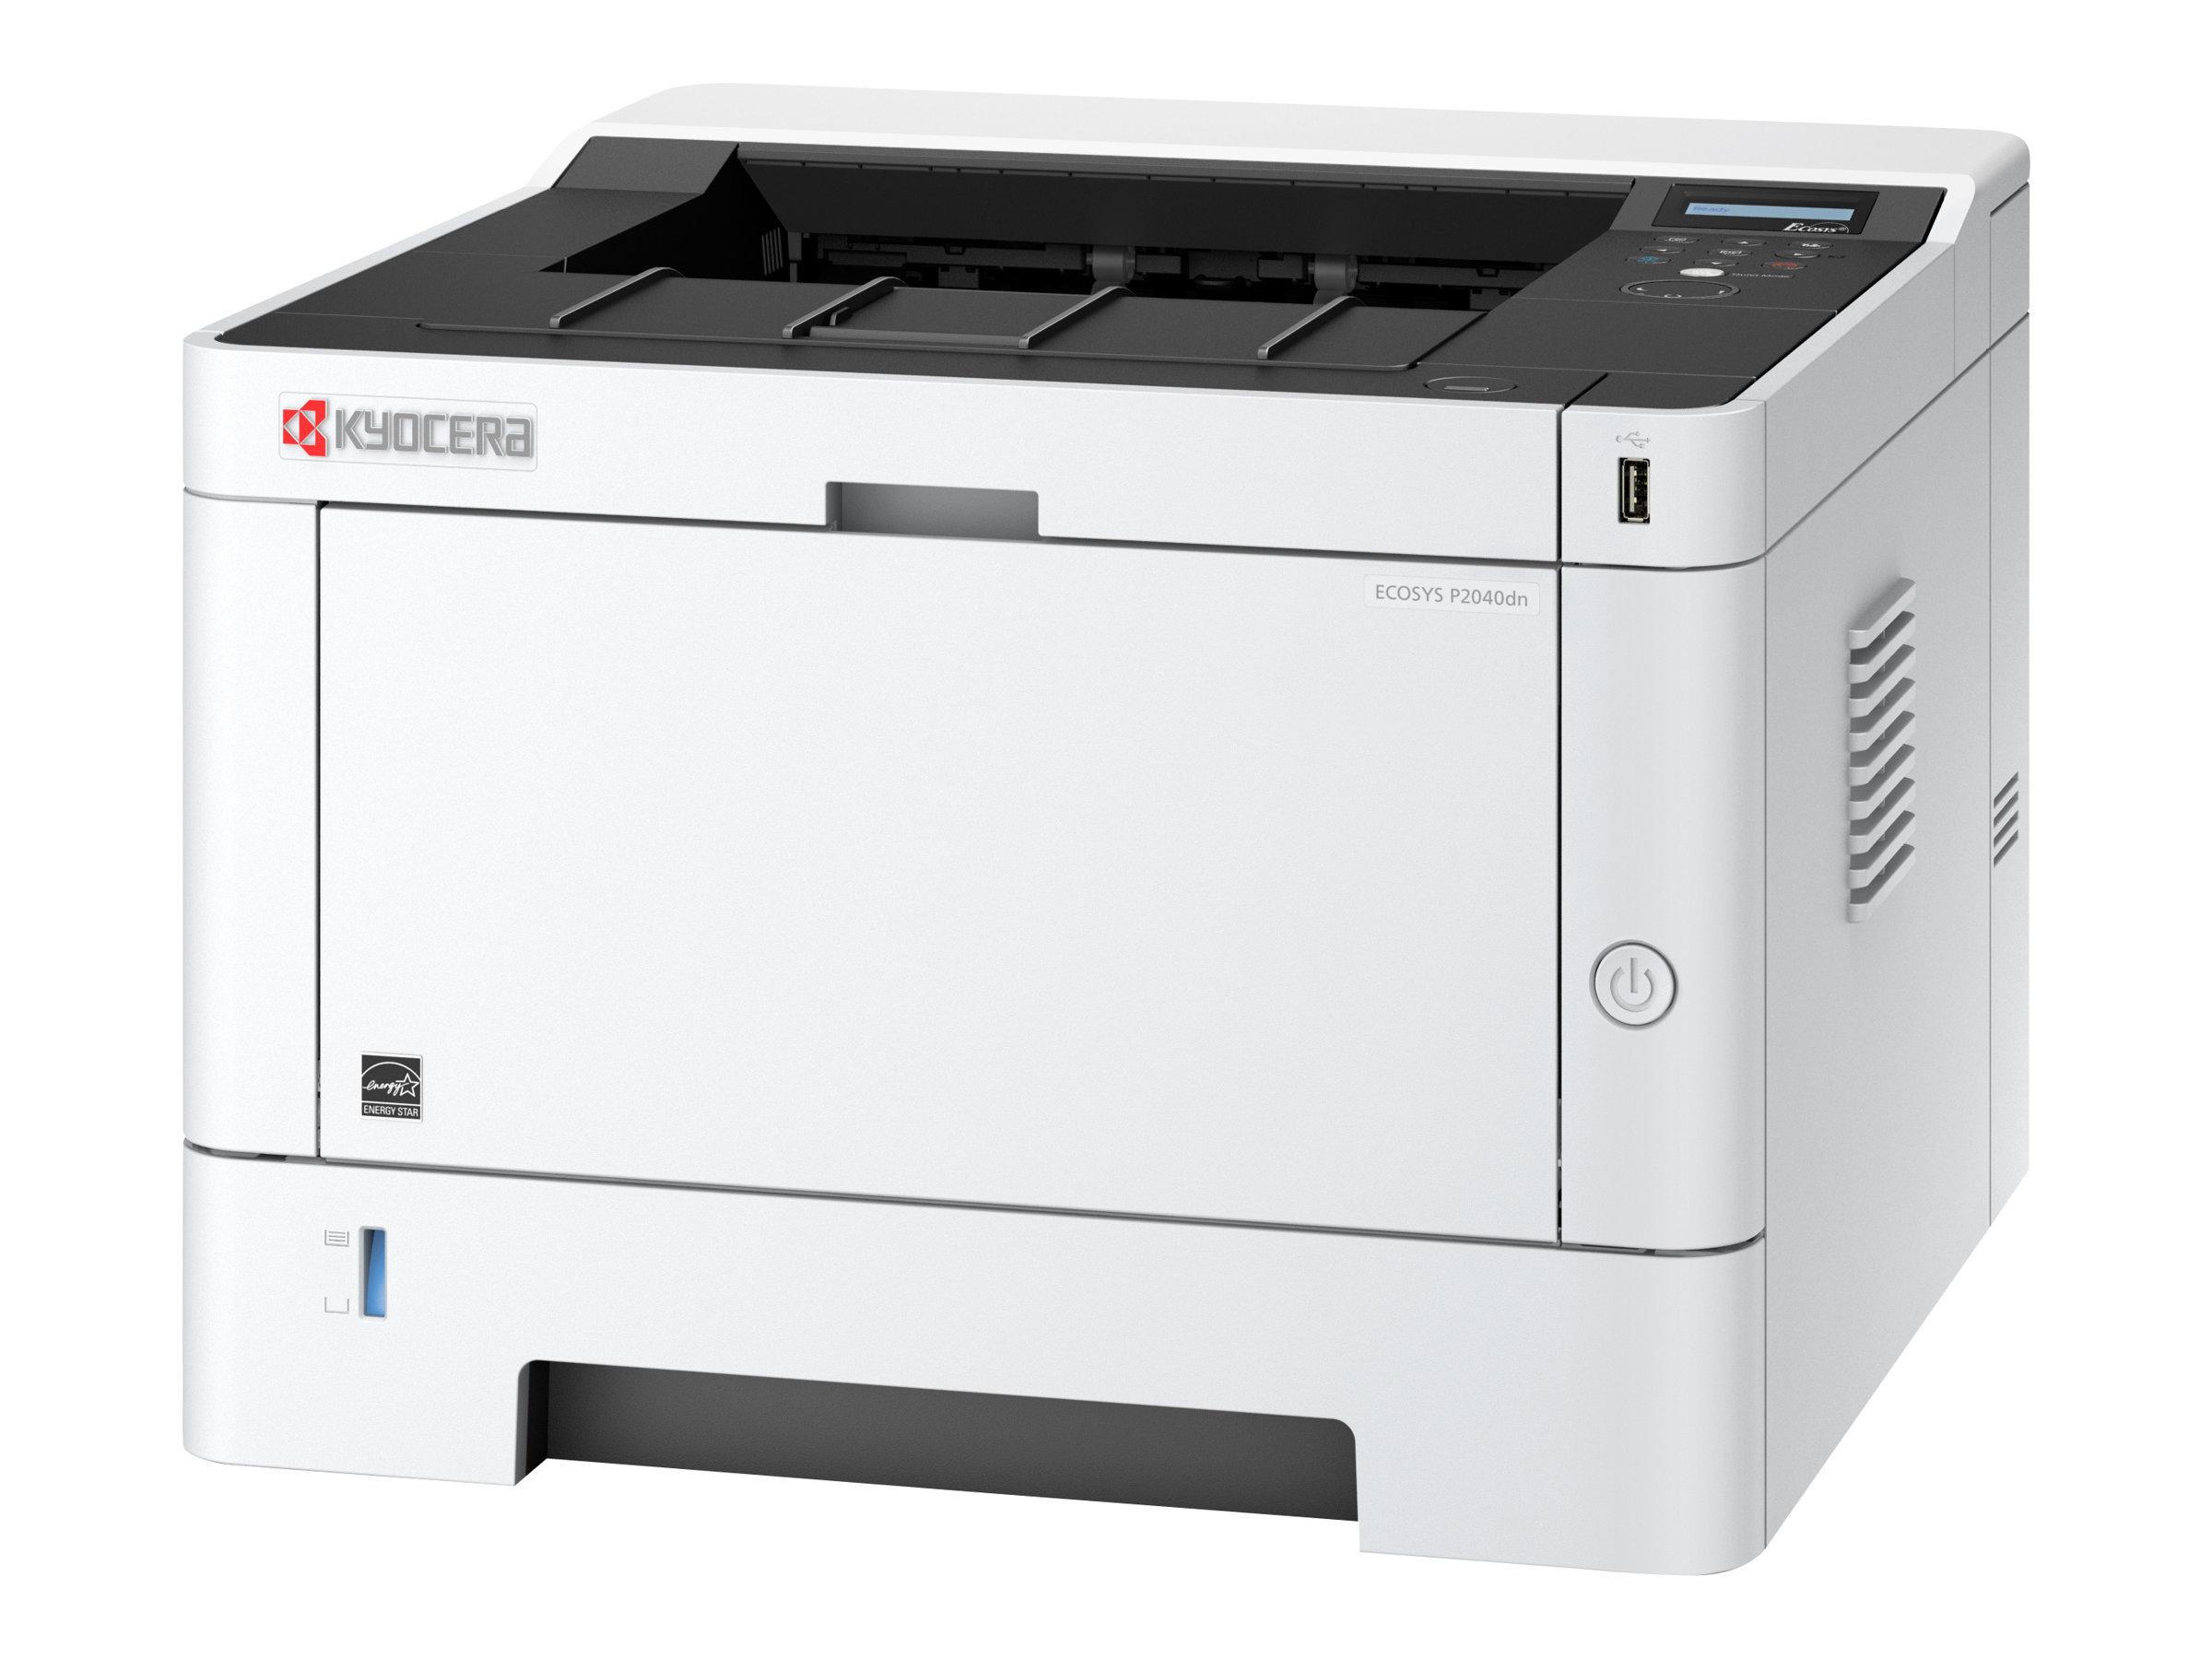 Kyocera ECOSYS P2040dn - Drucker - s/w - Duplex - Laser - A4/Legal